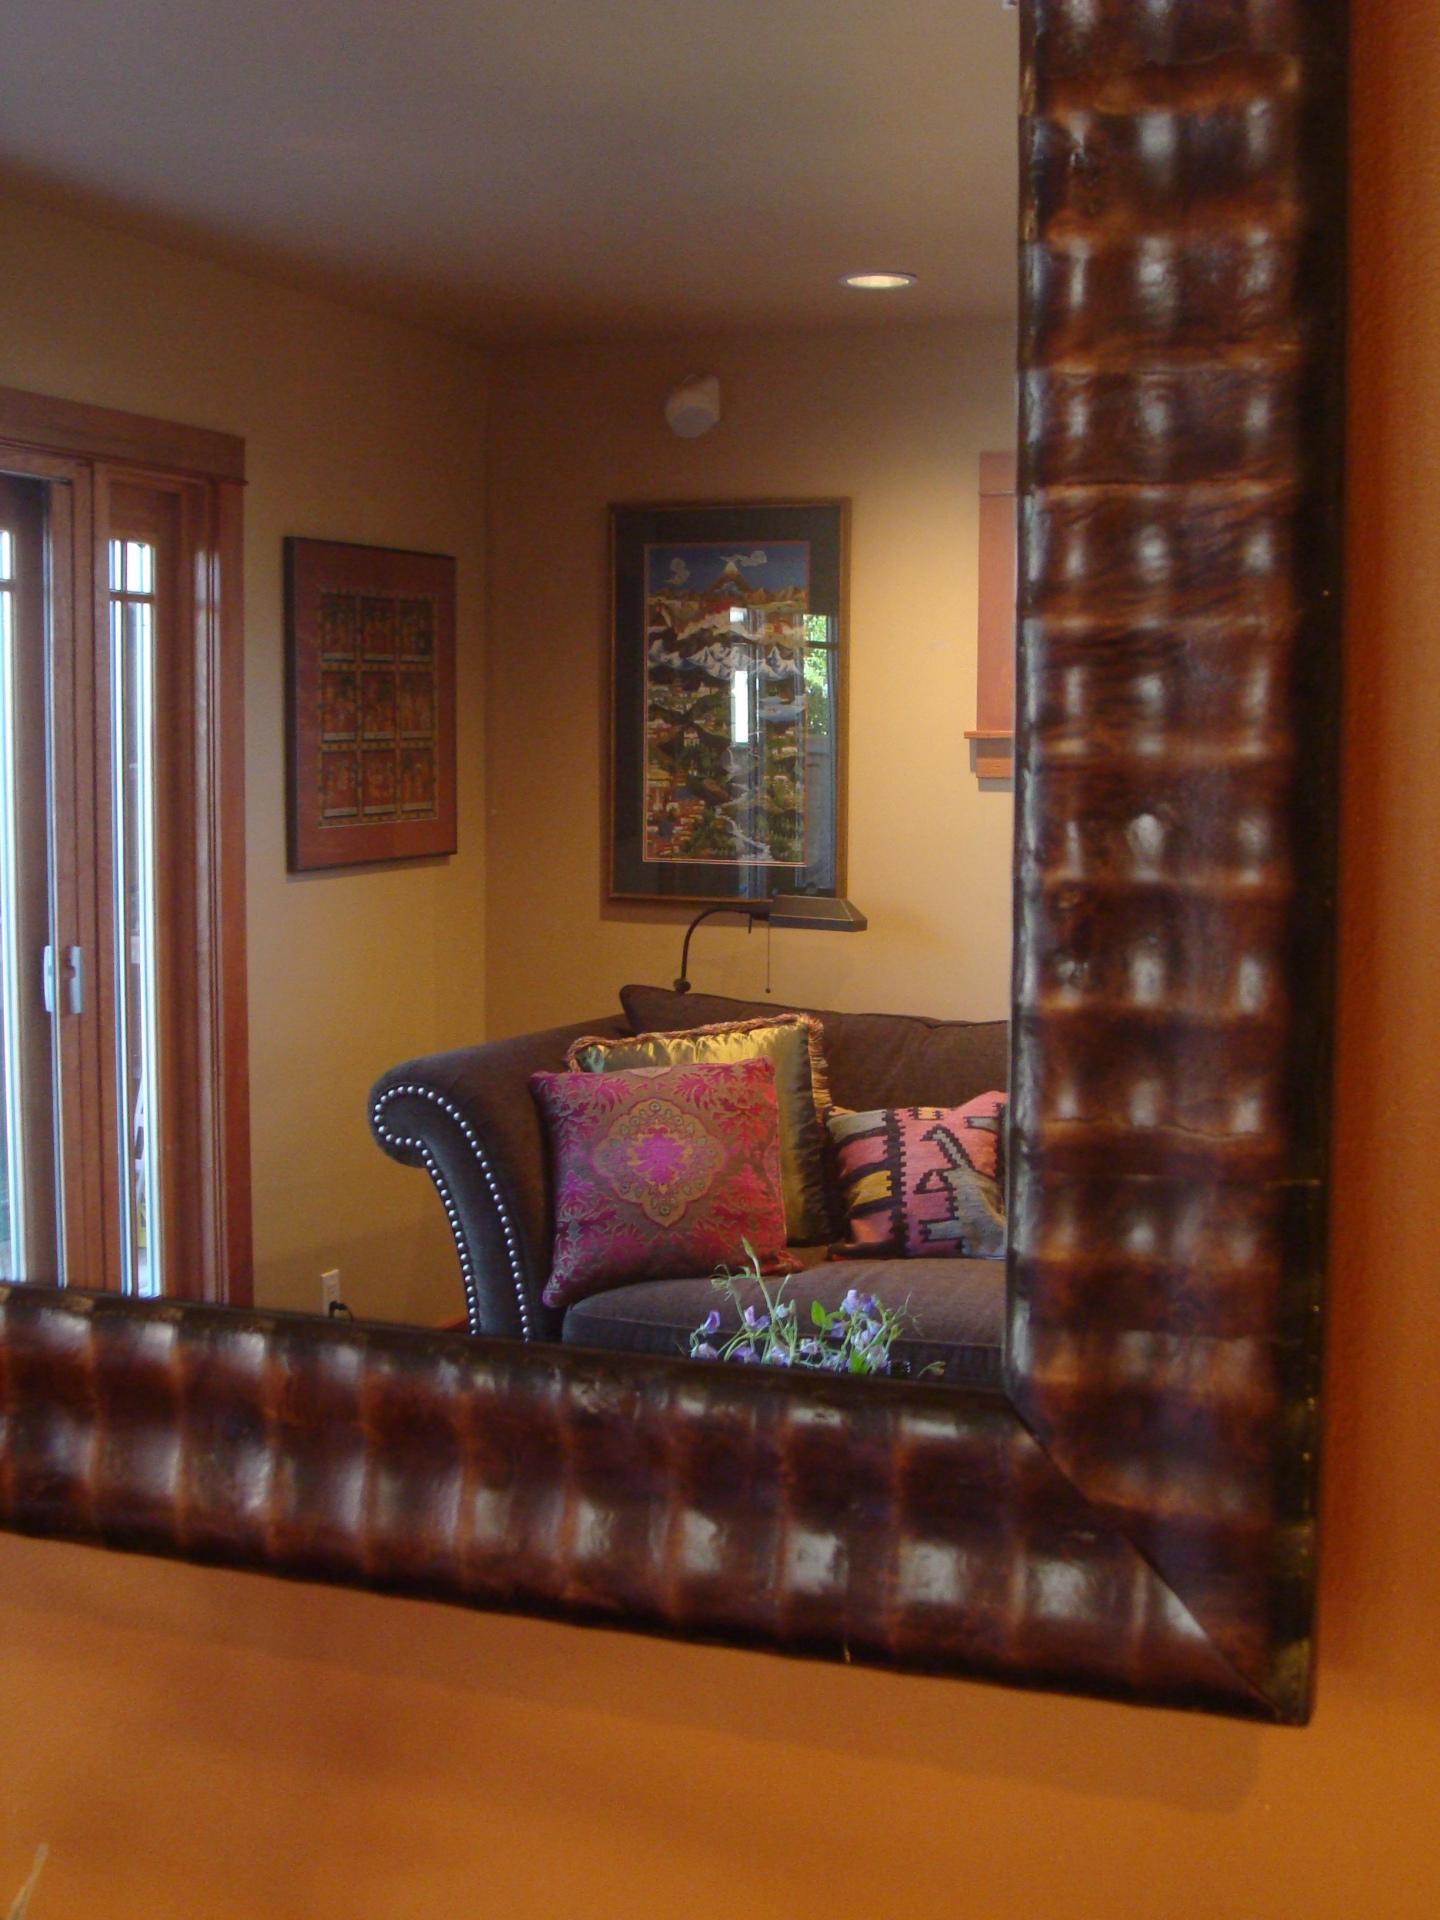 Fiorito Interior Design, interior design, remodel, television room, framed television, mirror television, hidden TV, ethnic, eclectic